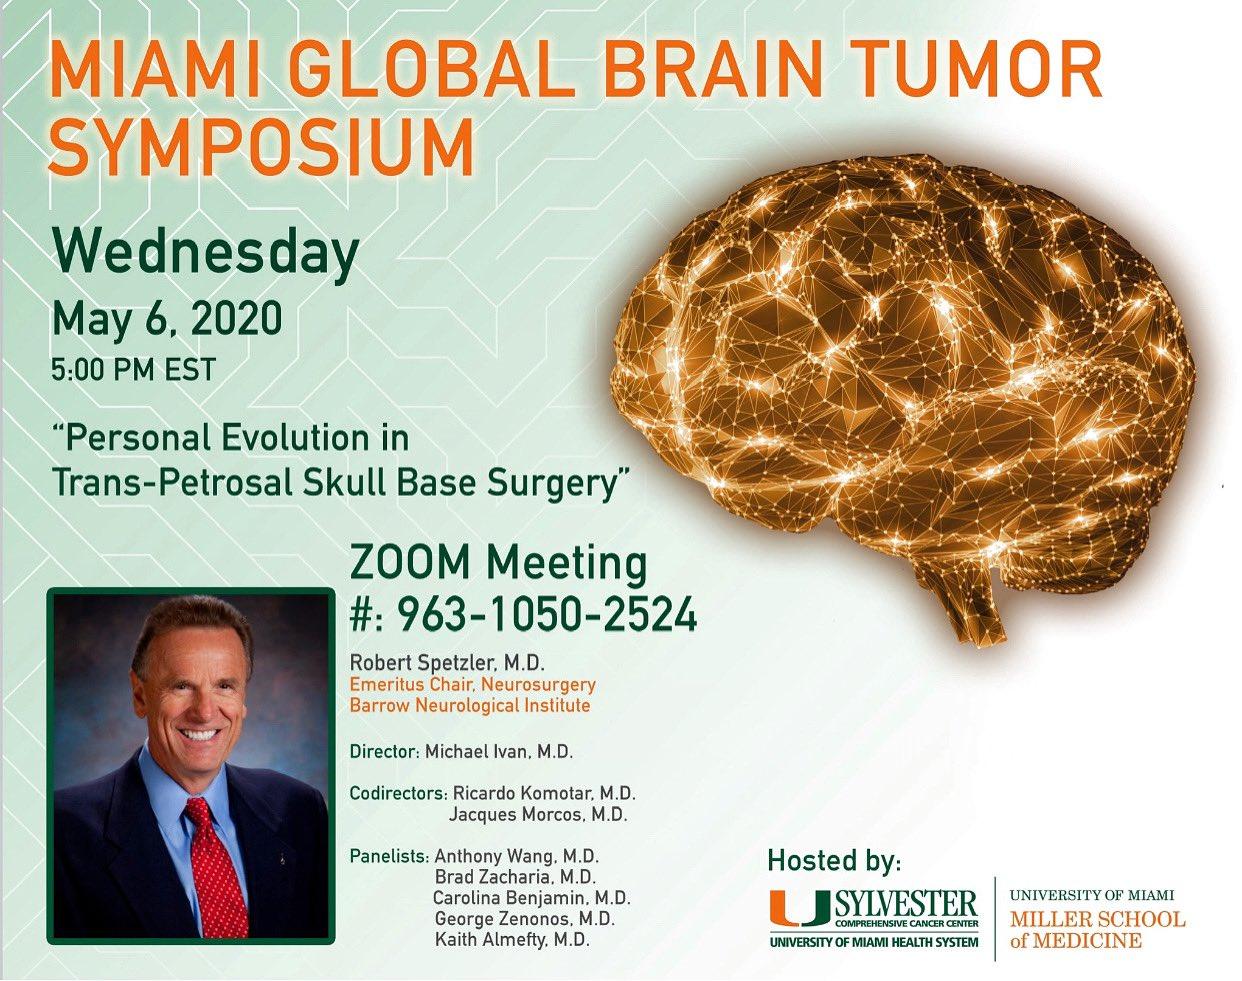 Global Brain Tumor Symposium Course 2020